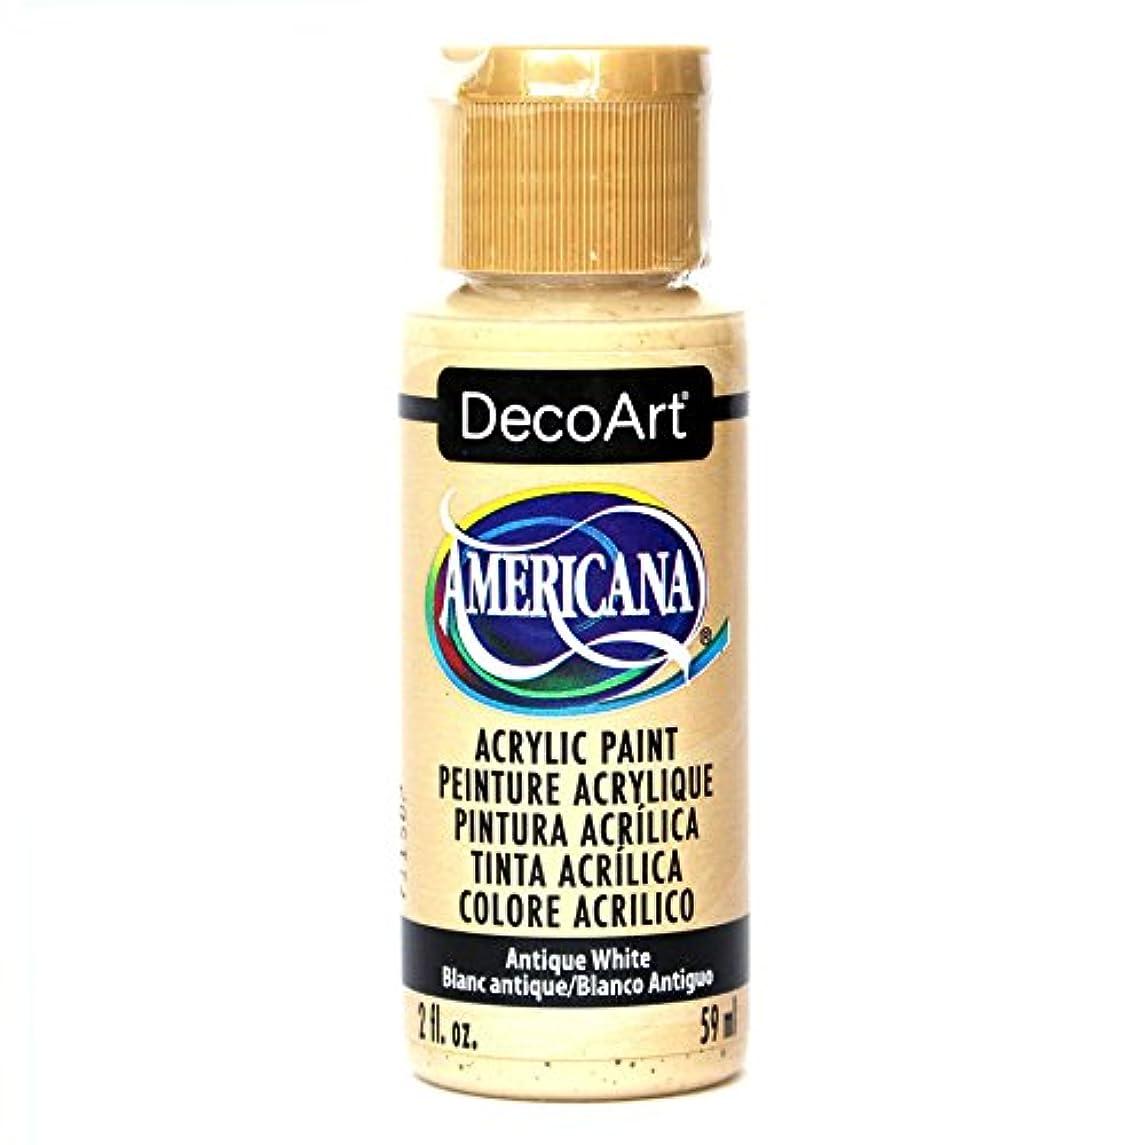 DecoArt Americana Acrylic Paint, 2-Ounce, Antique White